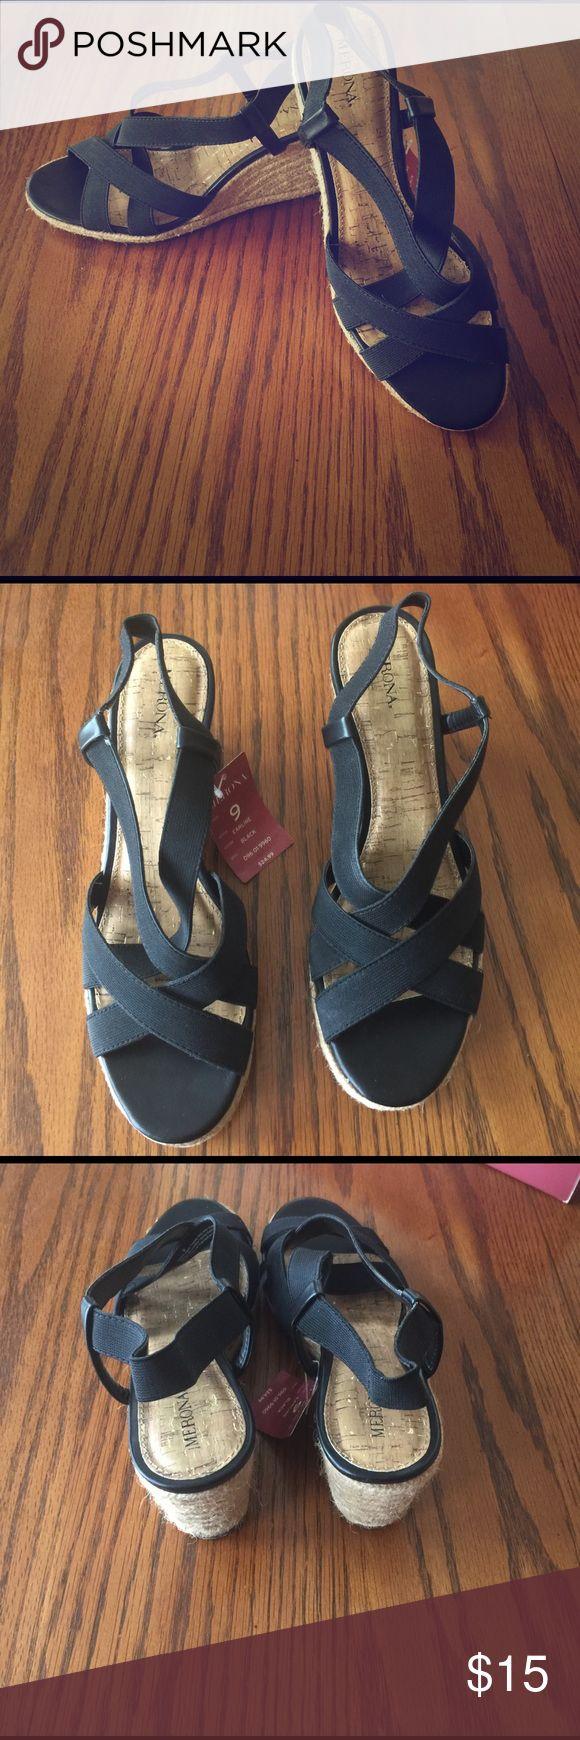 Ladies wedge sandal NWT 4 inch wedge sandal.  Rubber sole bottom. Merona Shoes Wedges